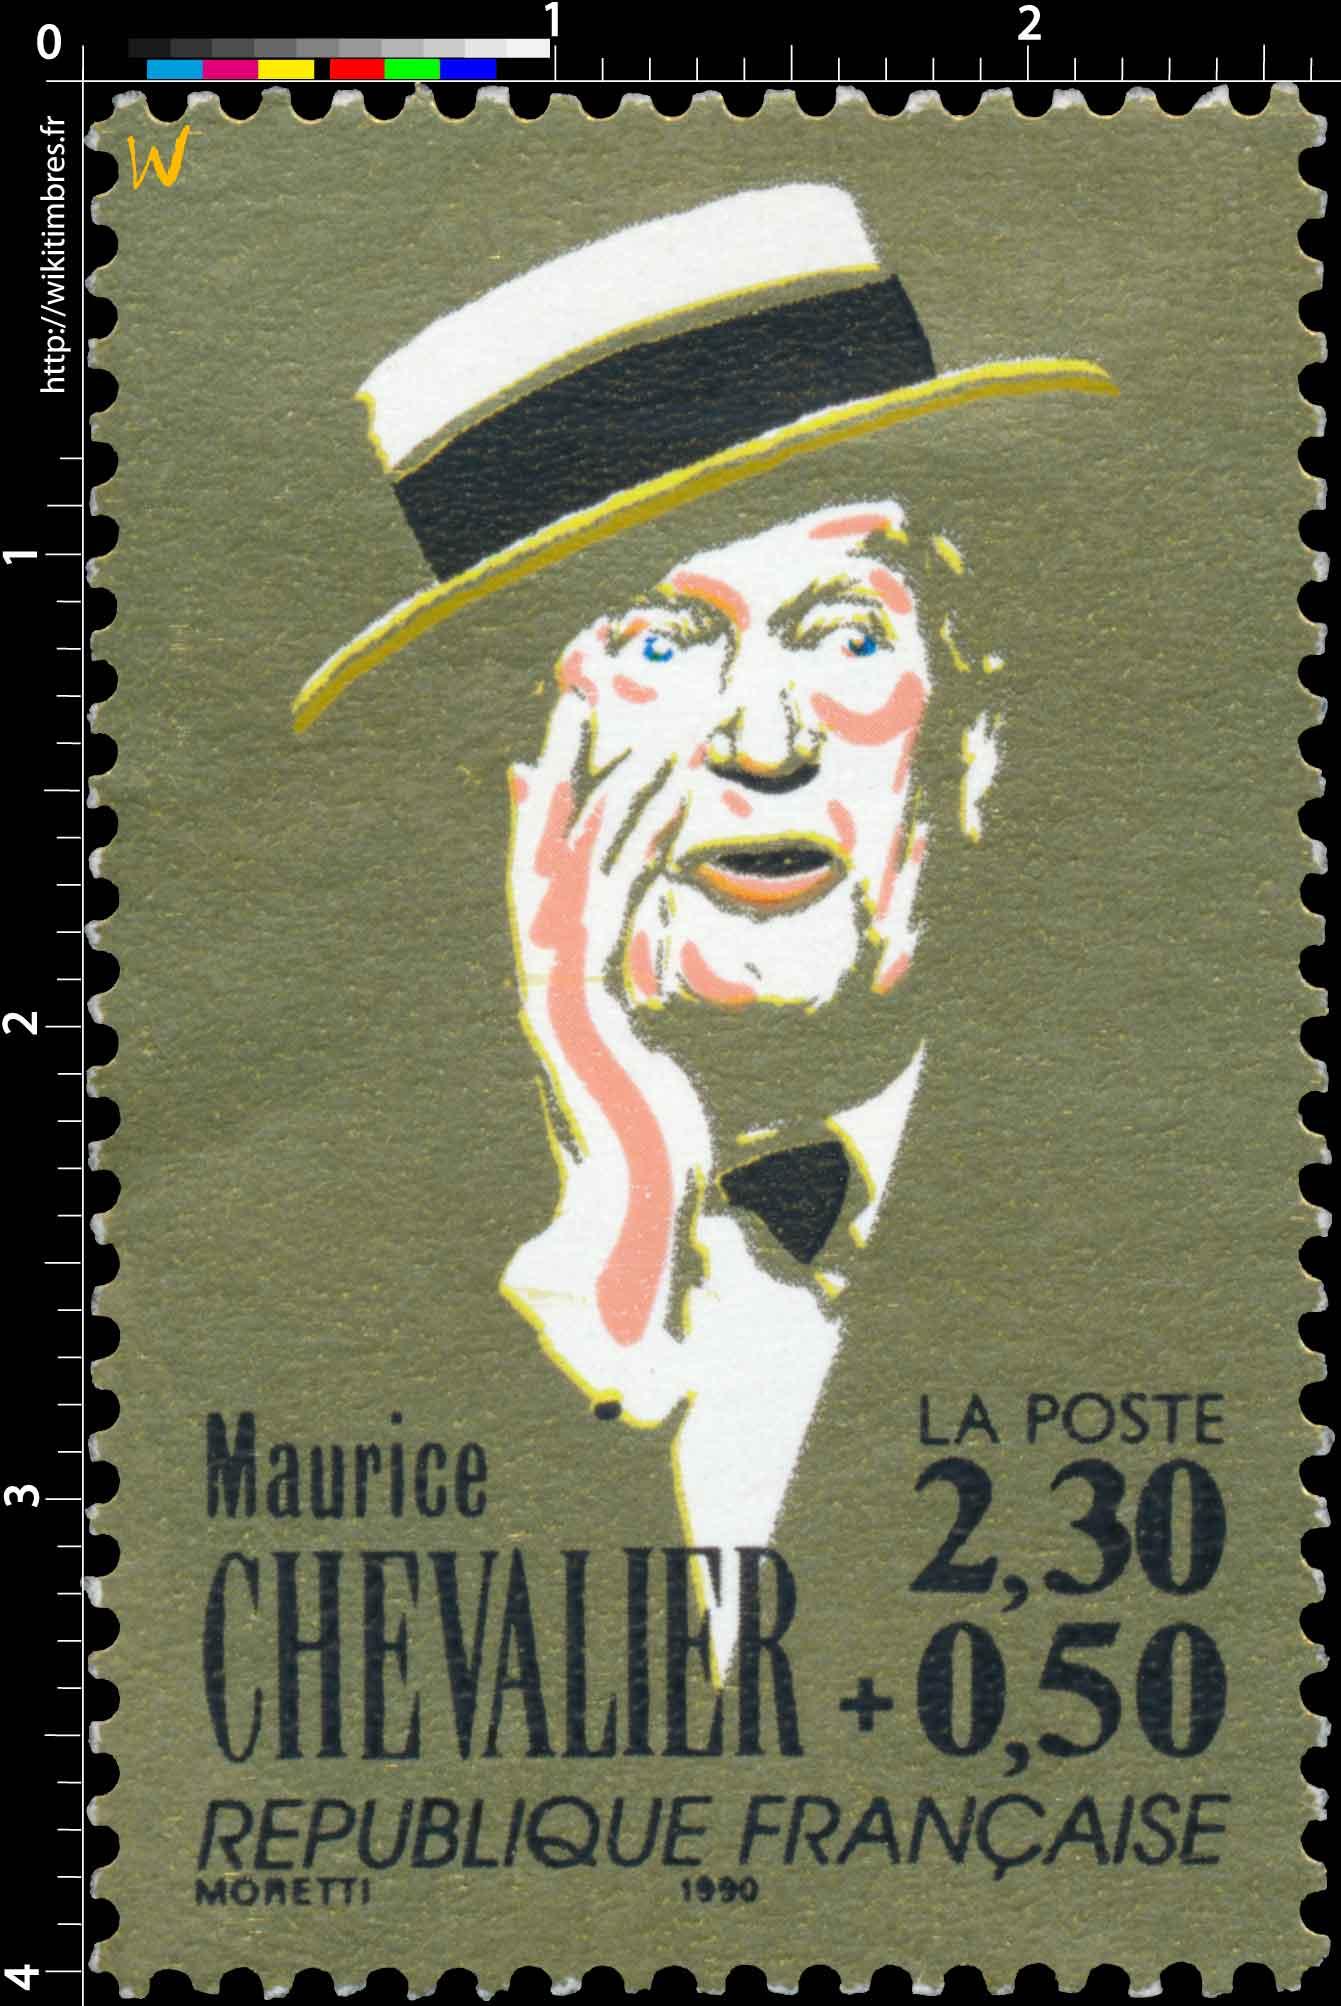 1990 Maurice CHEVALIER